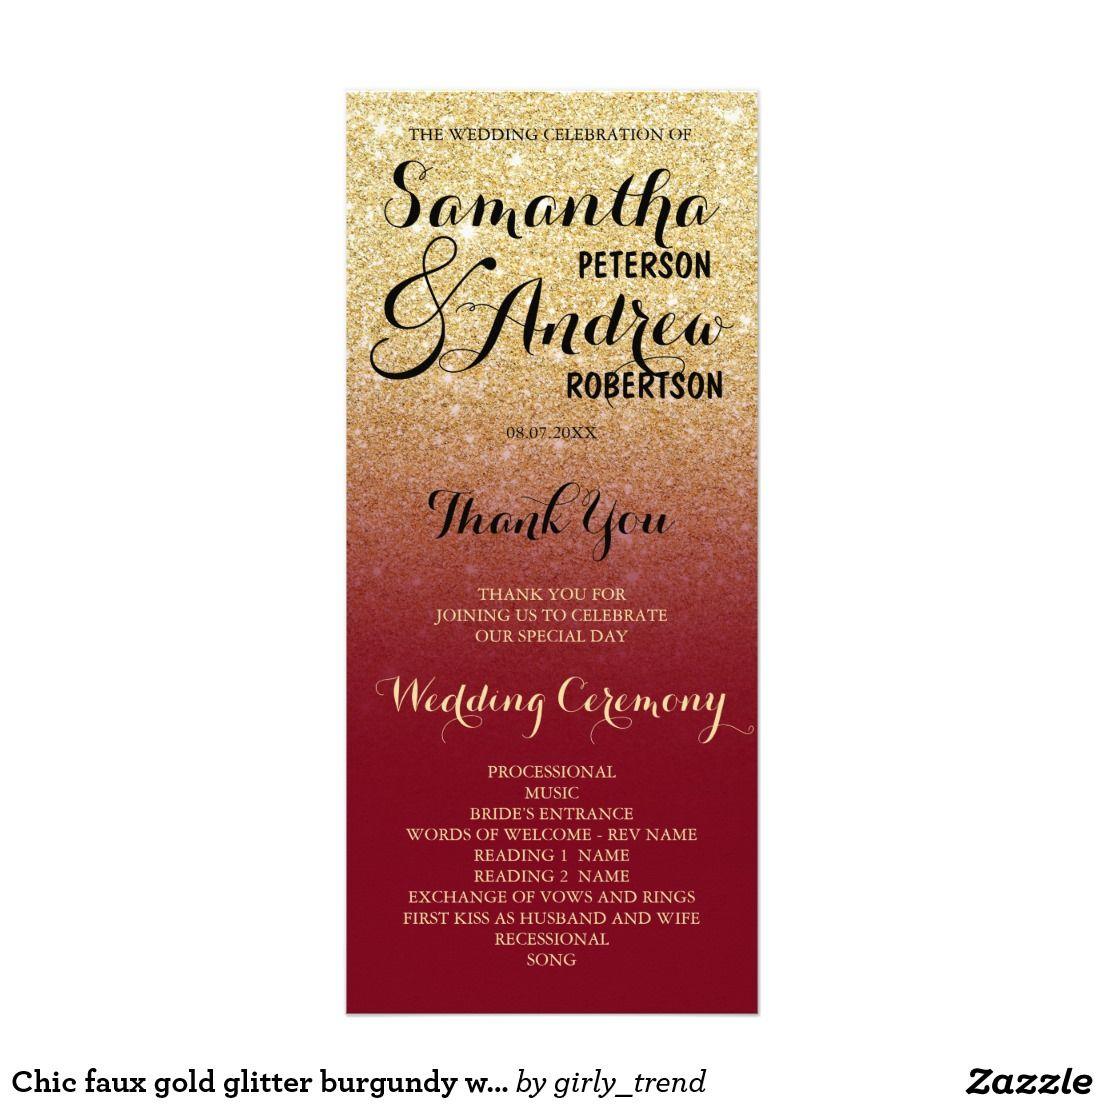 Chic faux gold glitter burgundy wedding program   Gold, Burgundy ...